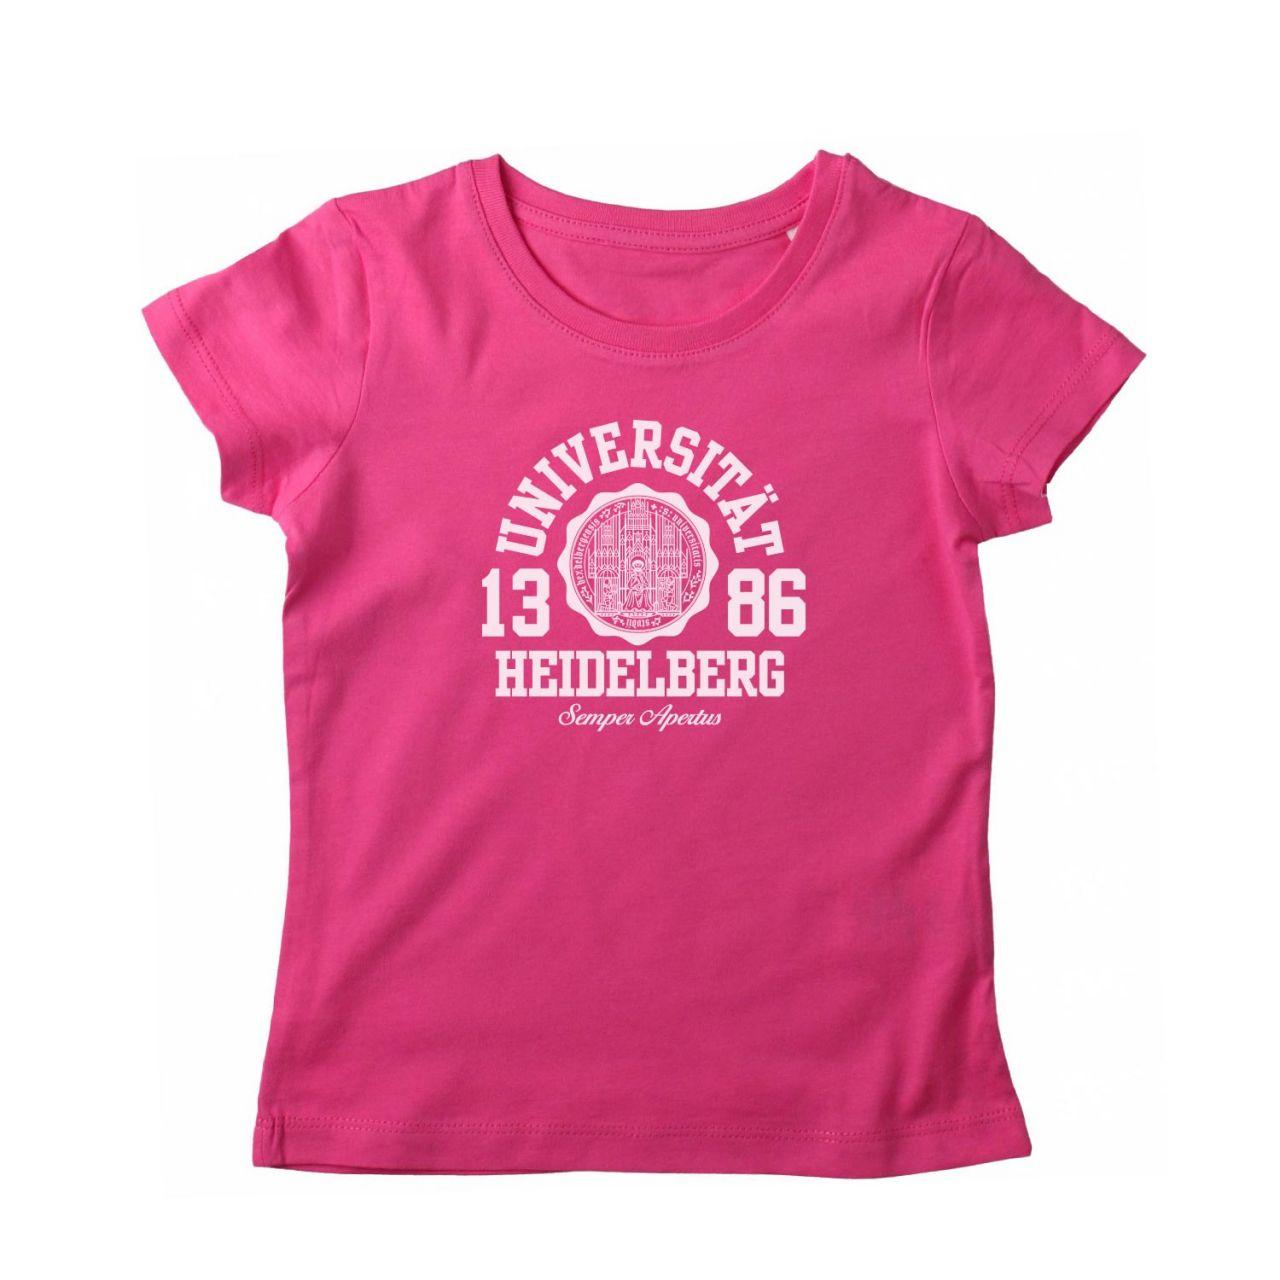 Girls Organic T-Shirt, pink, marshall